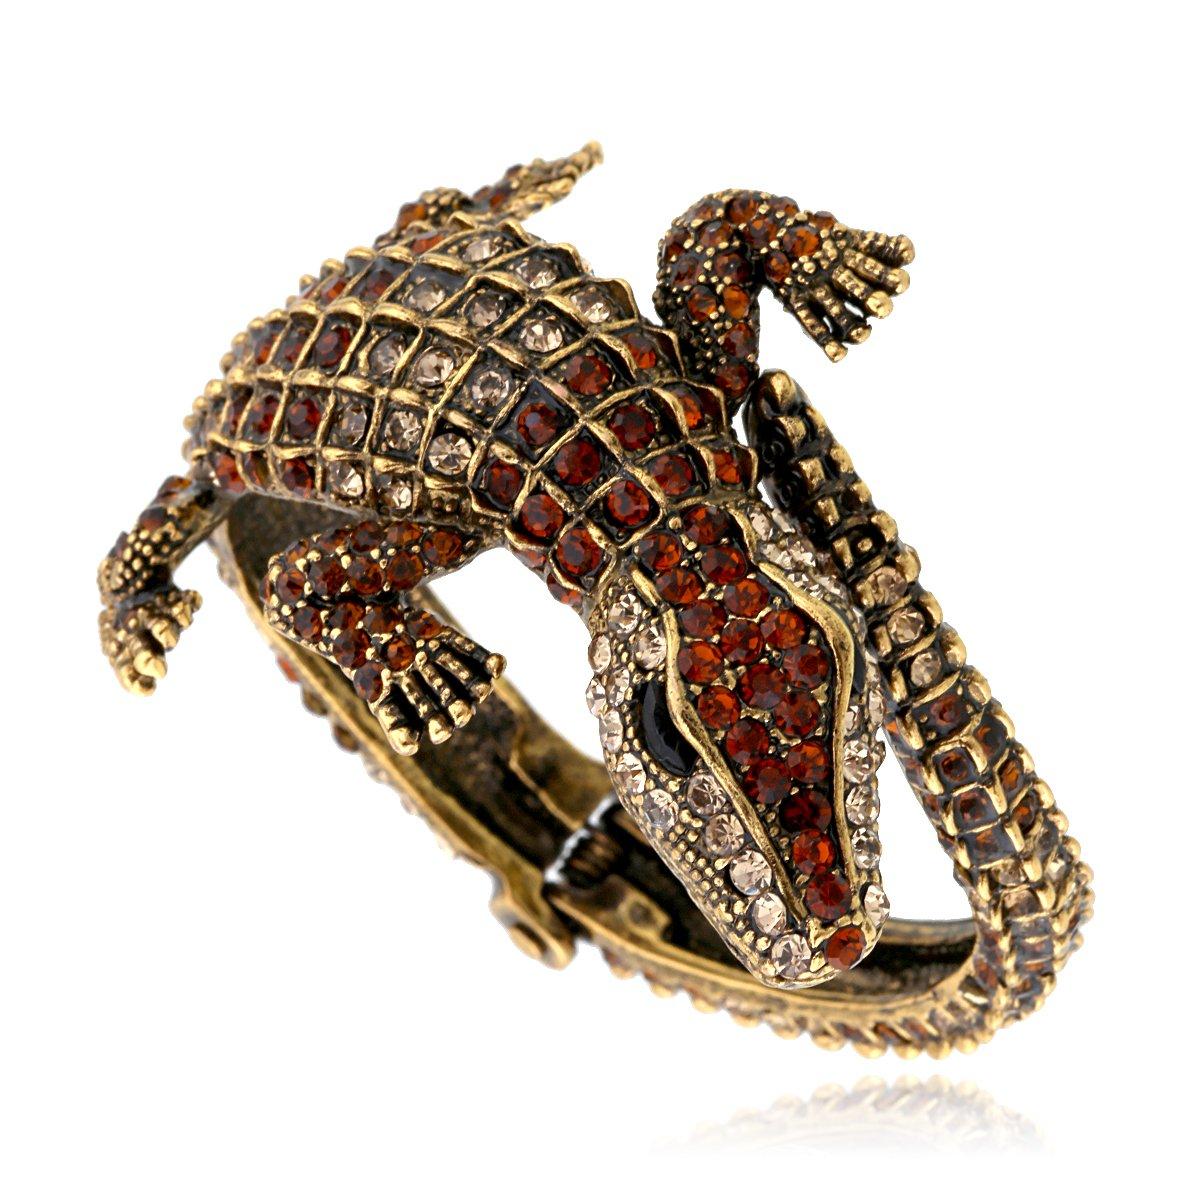 KAYMEN FASHION JEWELLERY Kaymen Jewelry Antique Gold Rhinestone Statement Cuff Bracelets Animal Style for Women